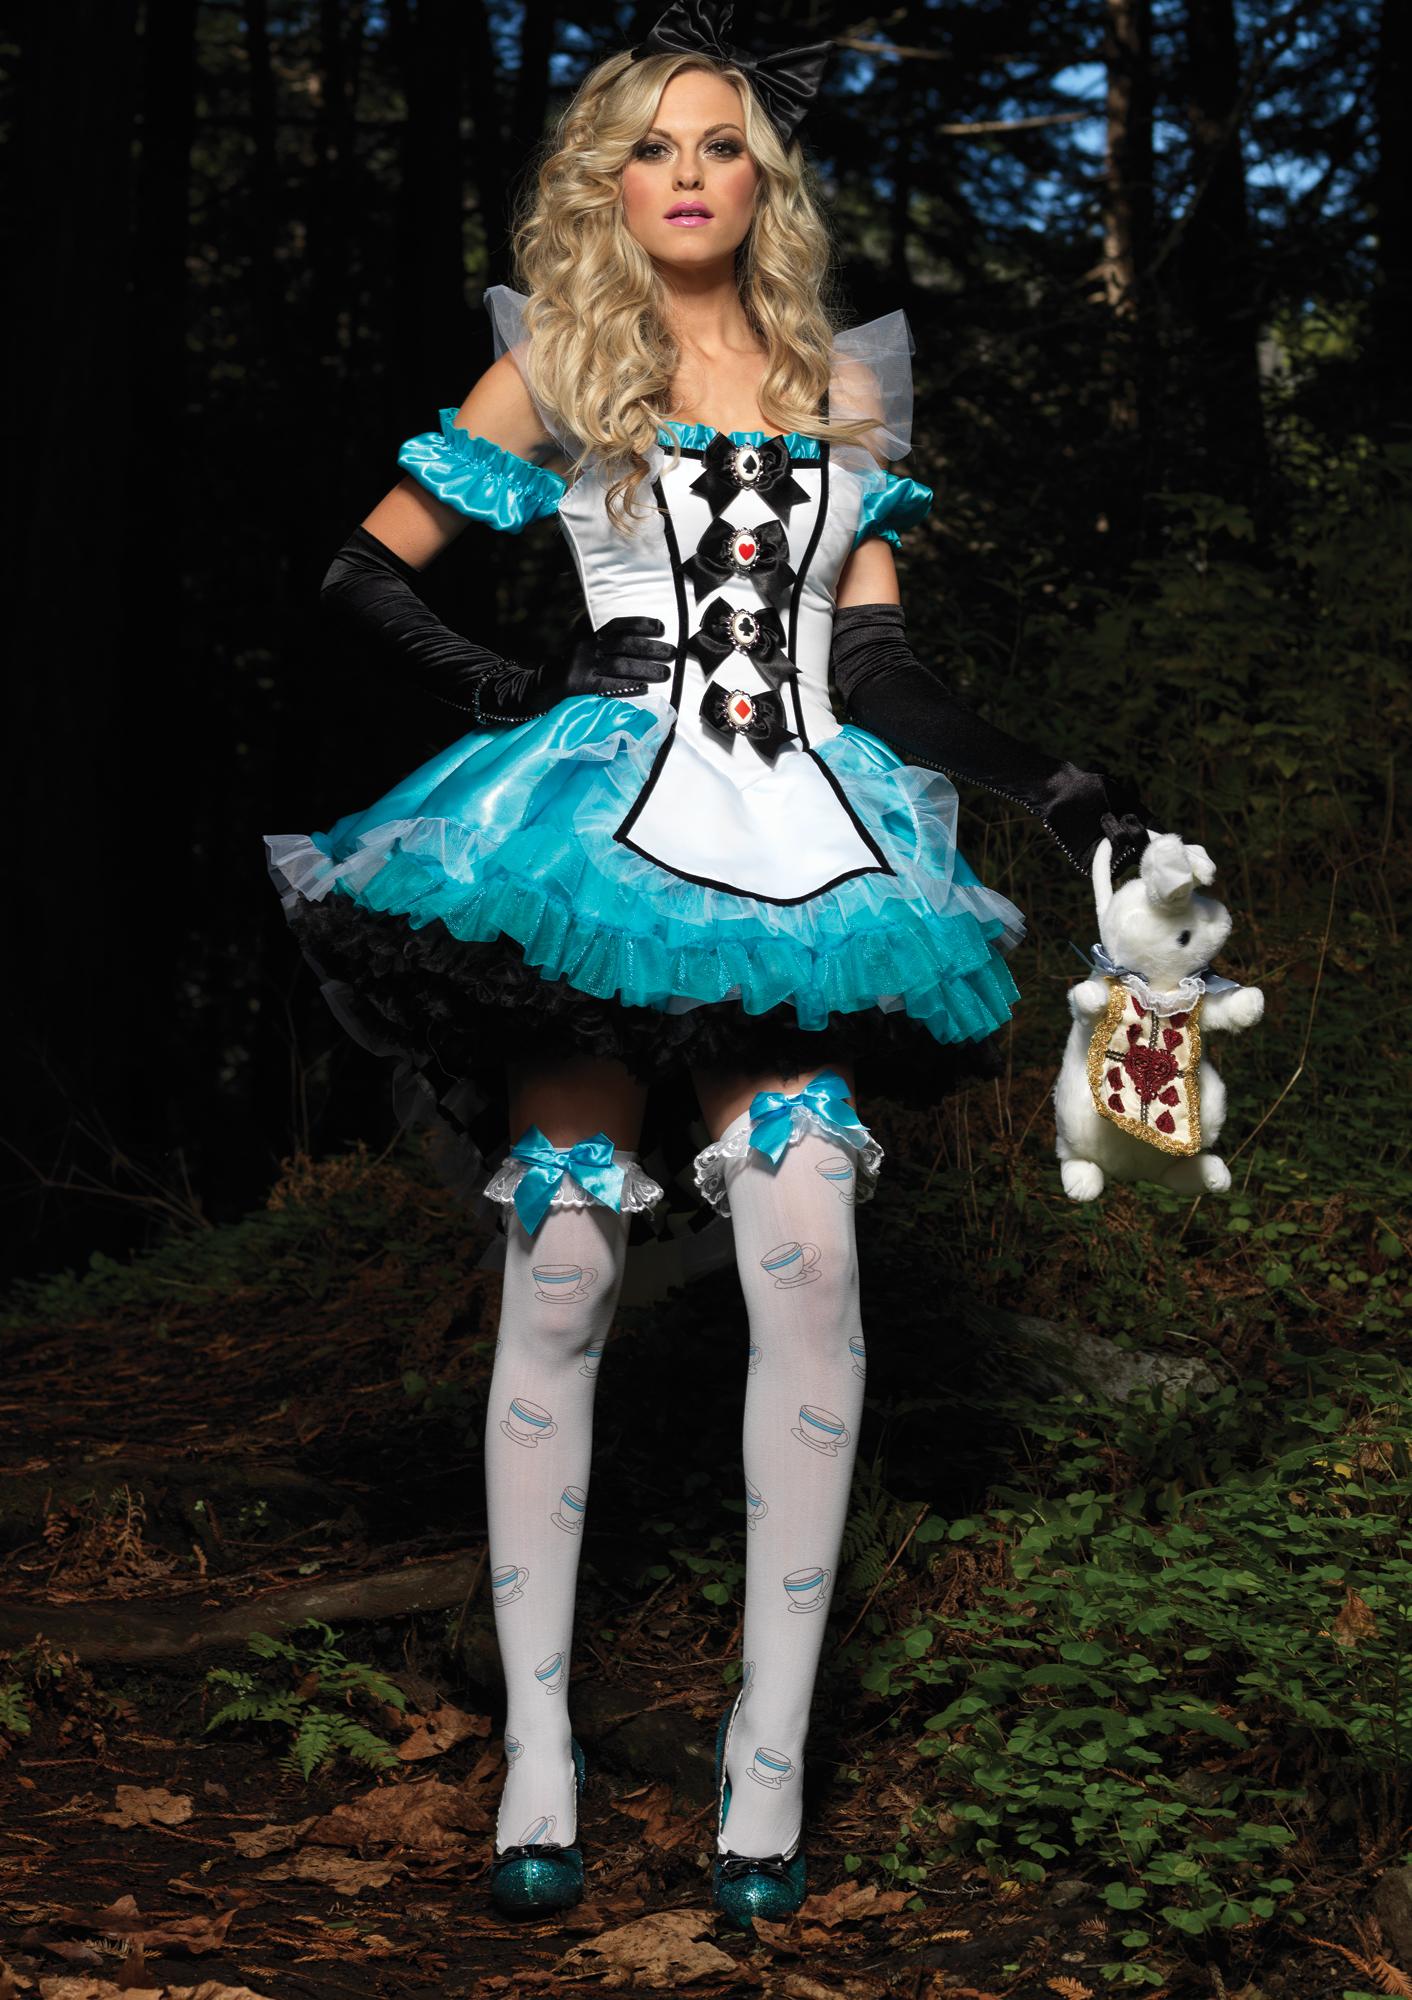 Chelsea Manor Unveils Its Sexy Halloween Costume